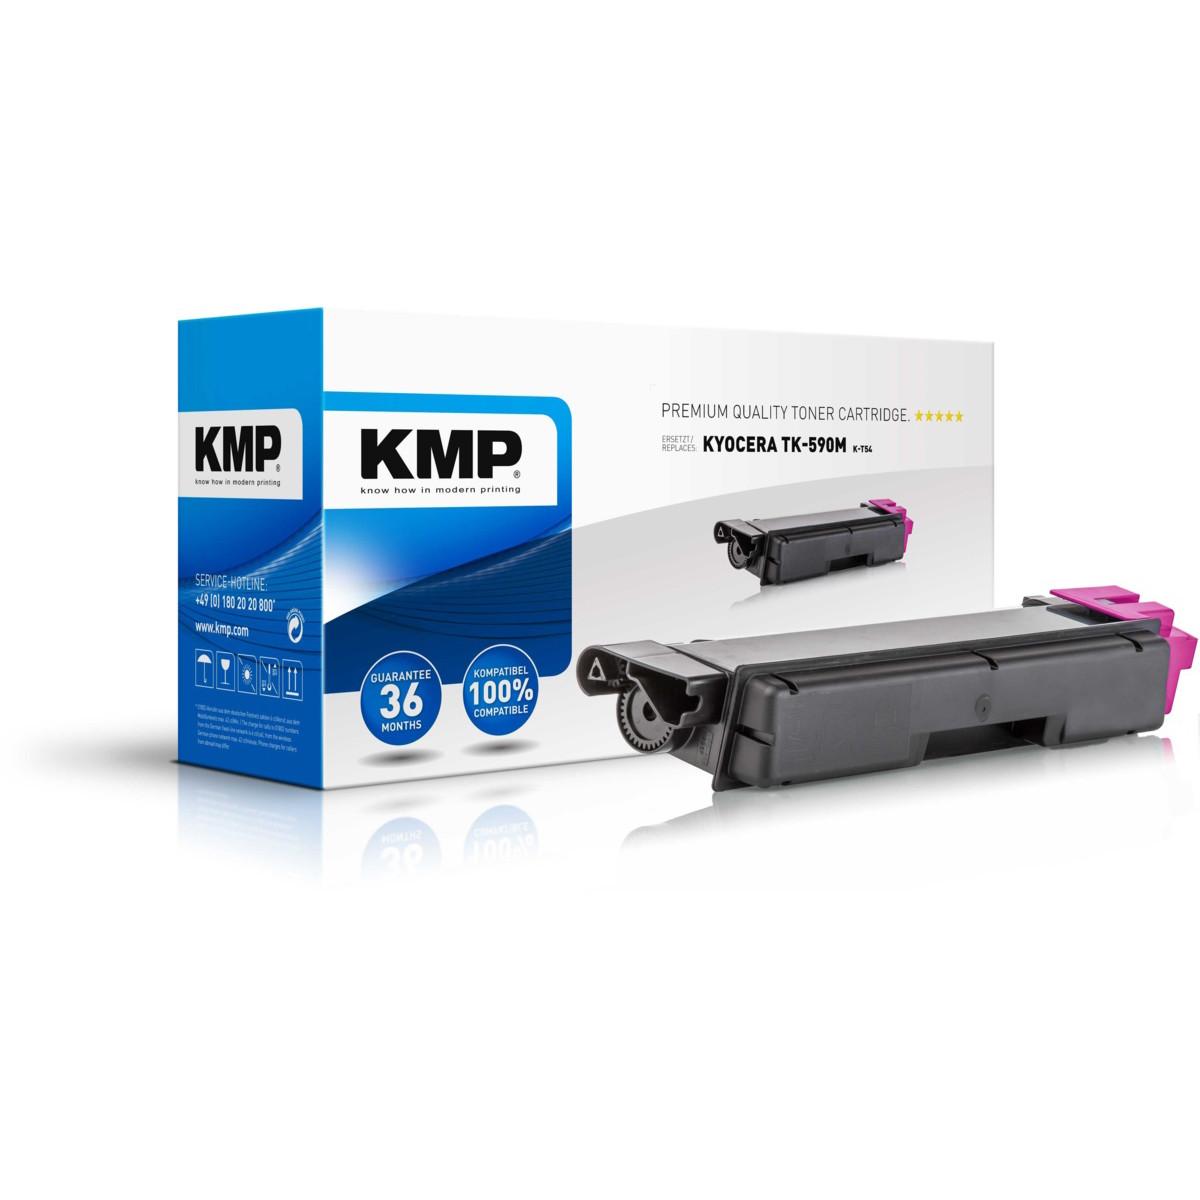 KMP Toner Kyocera TK-590M, - kompatibilný s čipom (Purpurová)